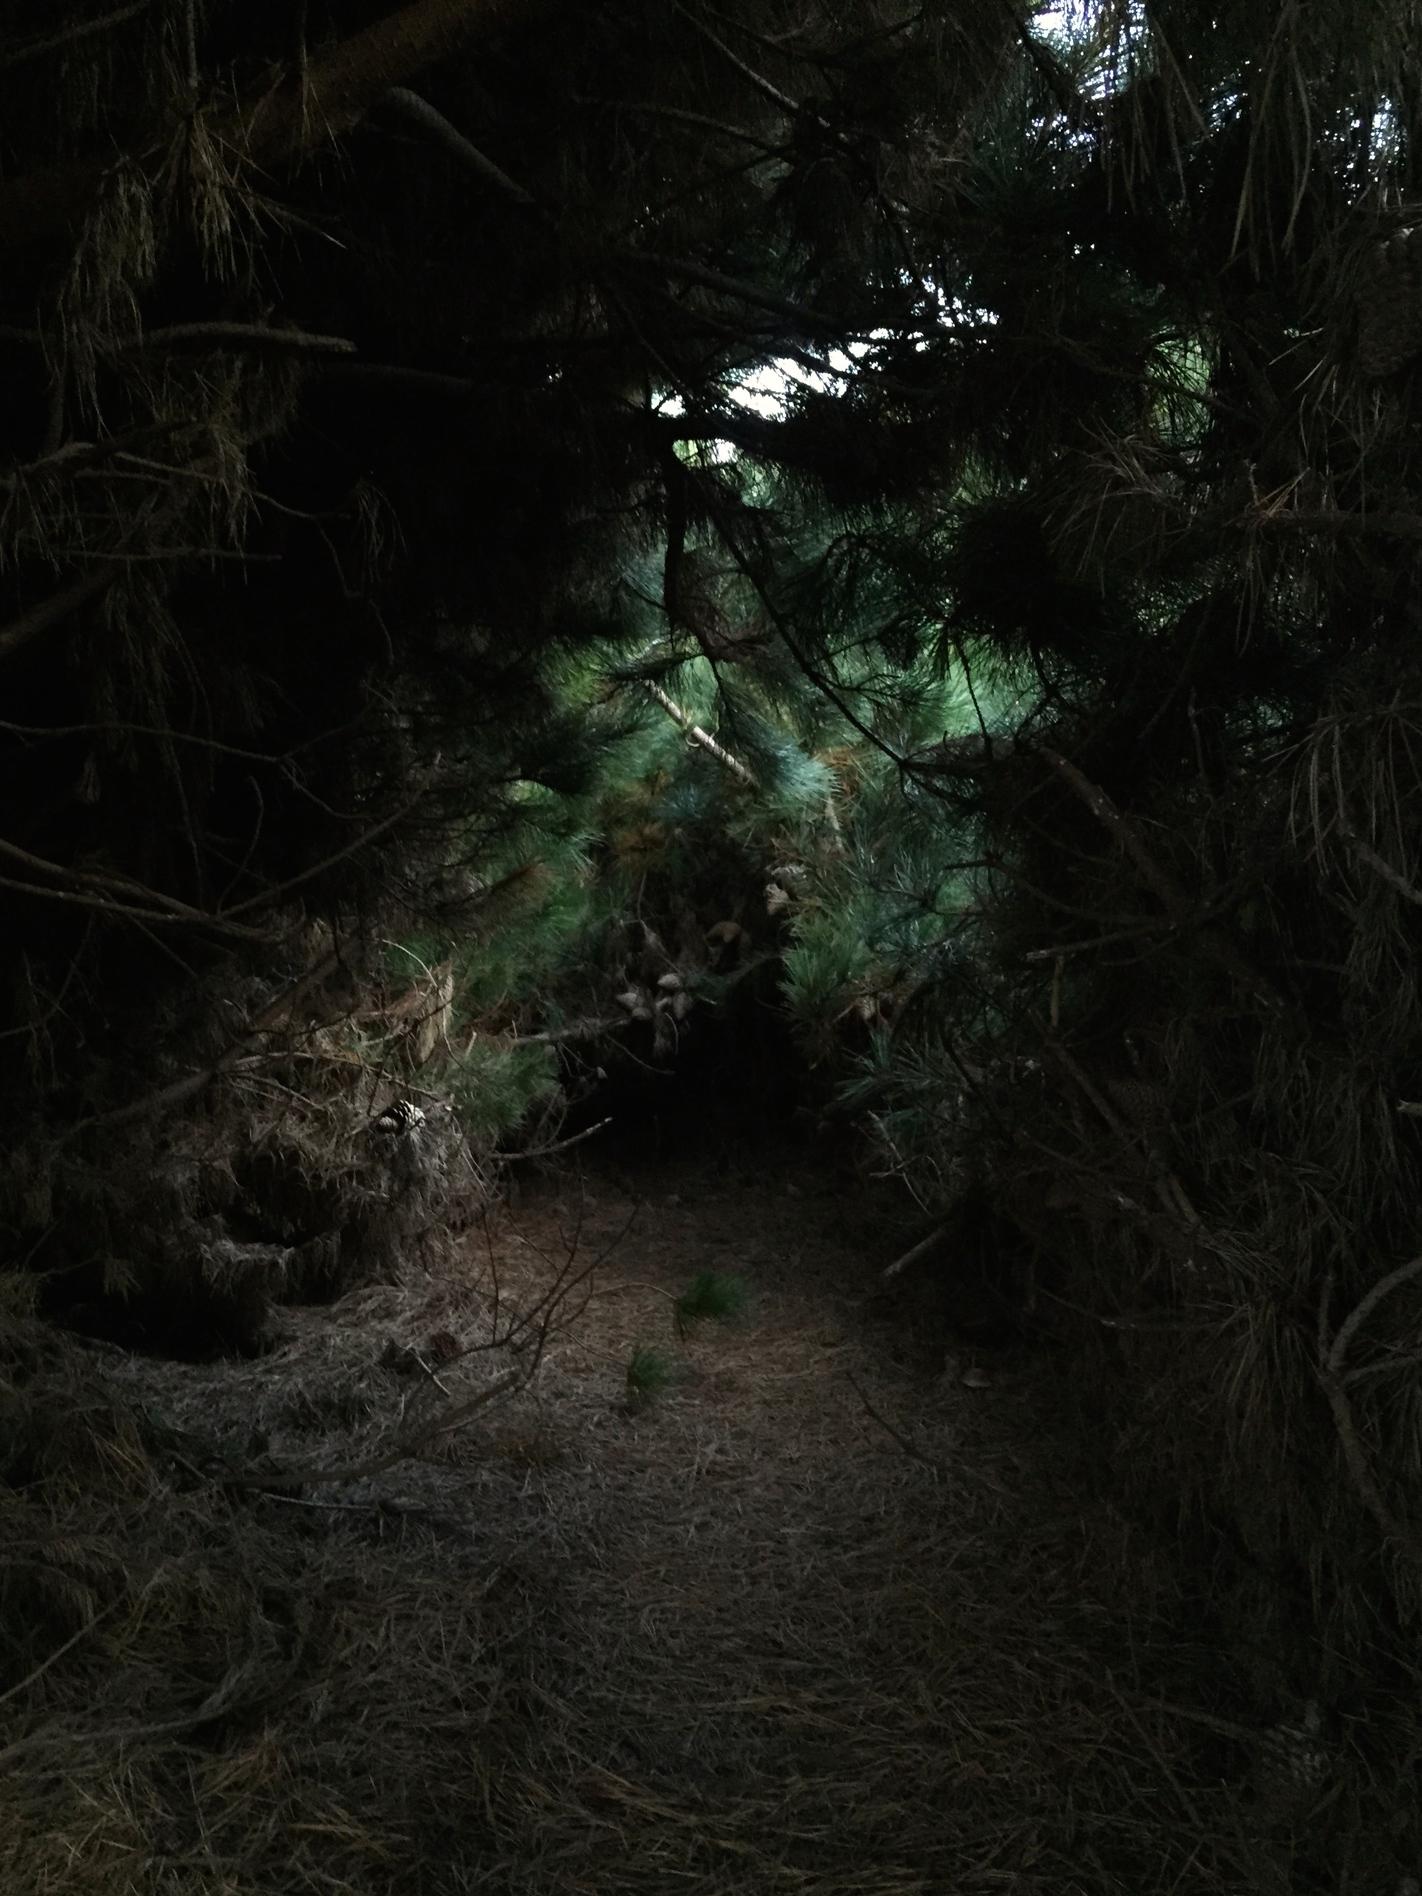 Through the fairy-tale tunnel